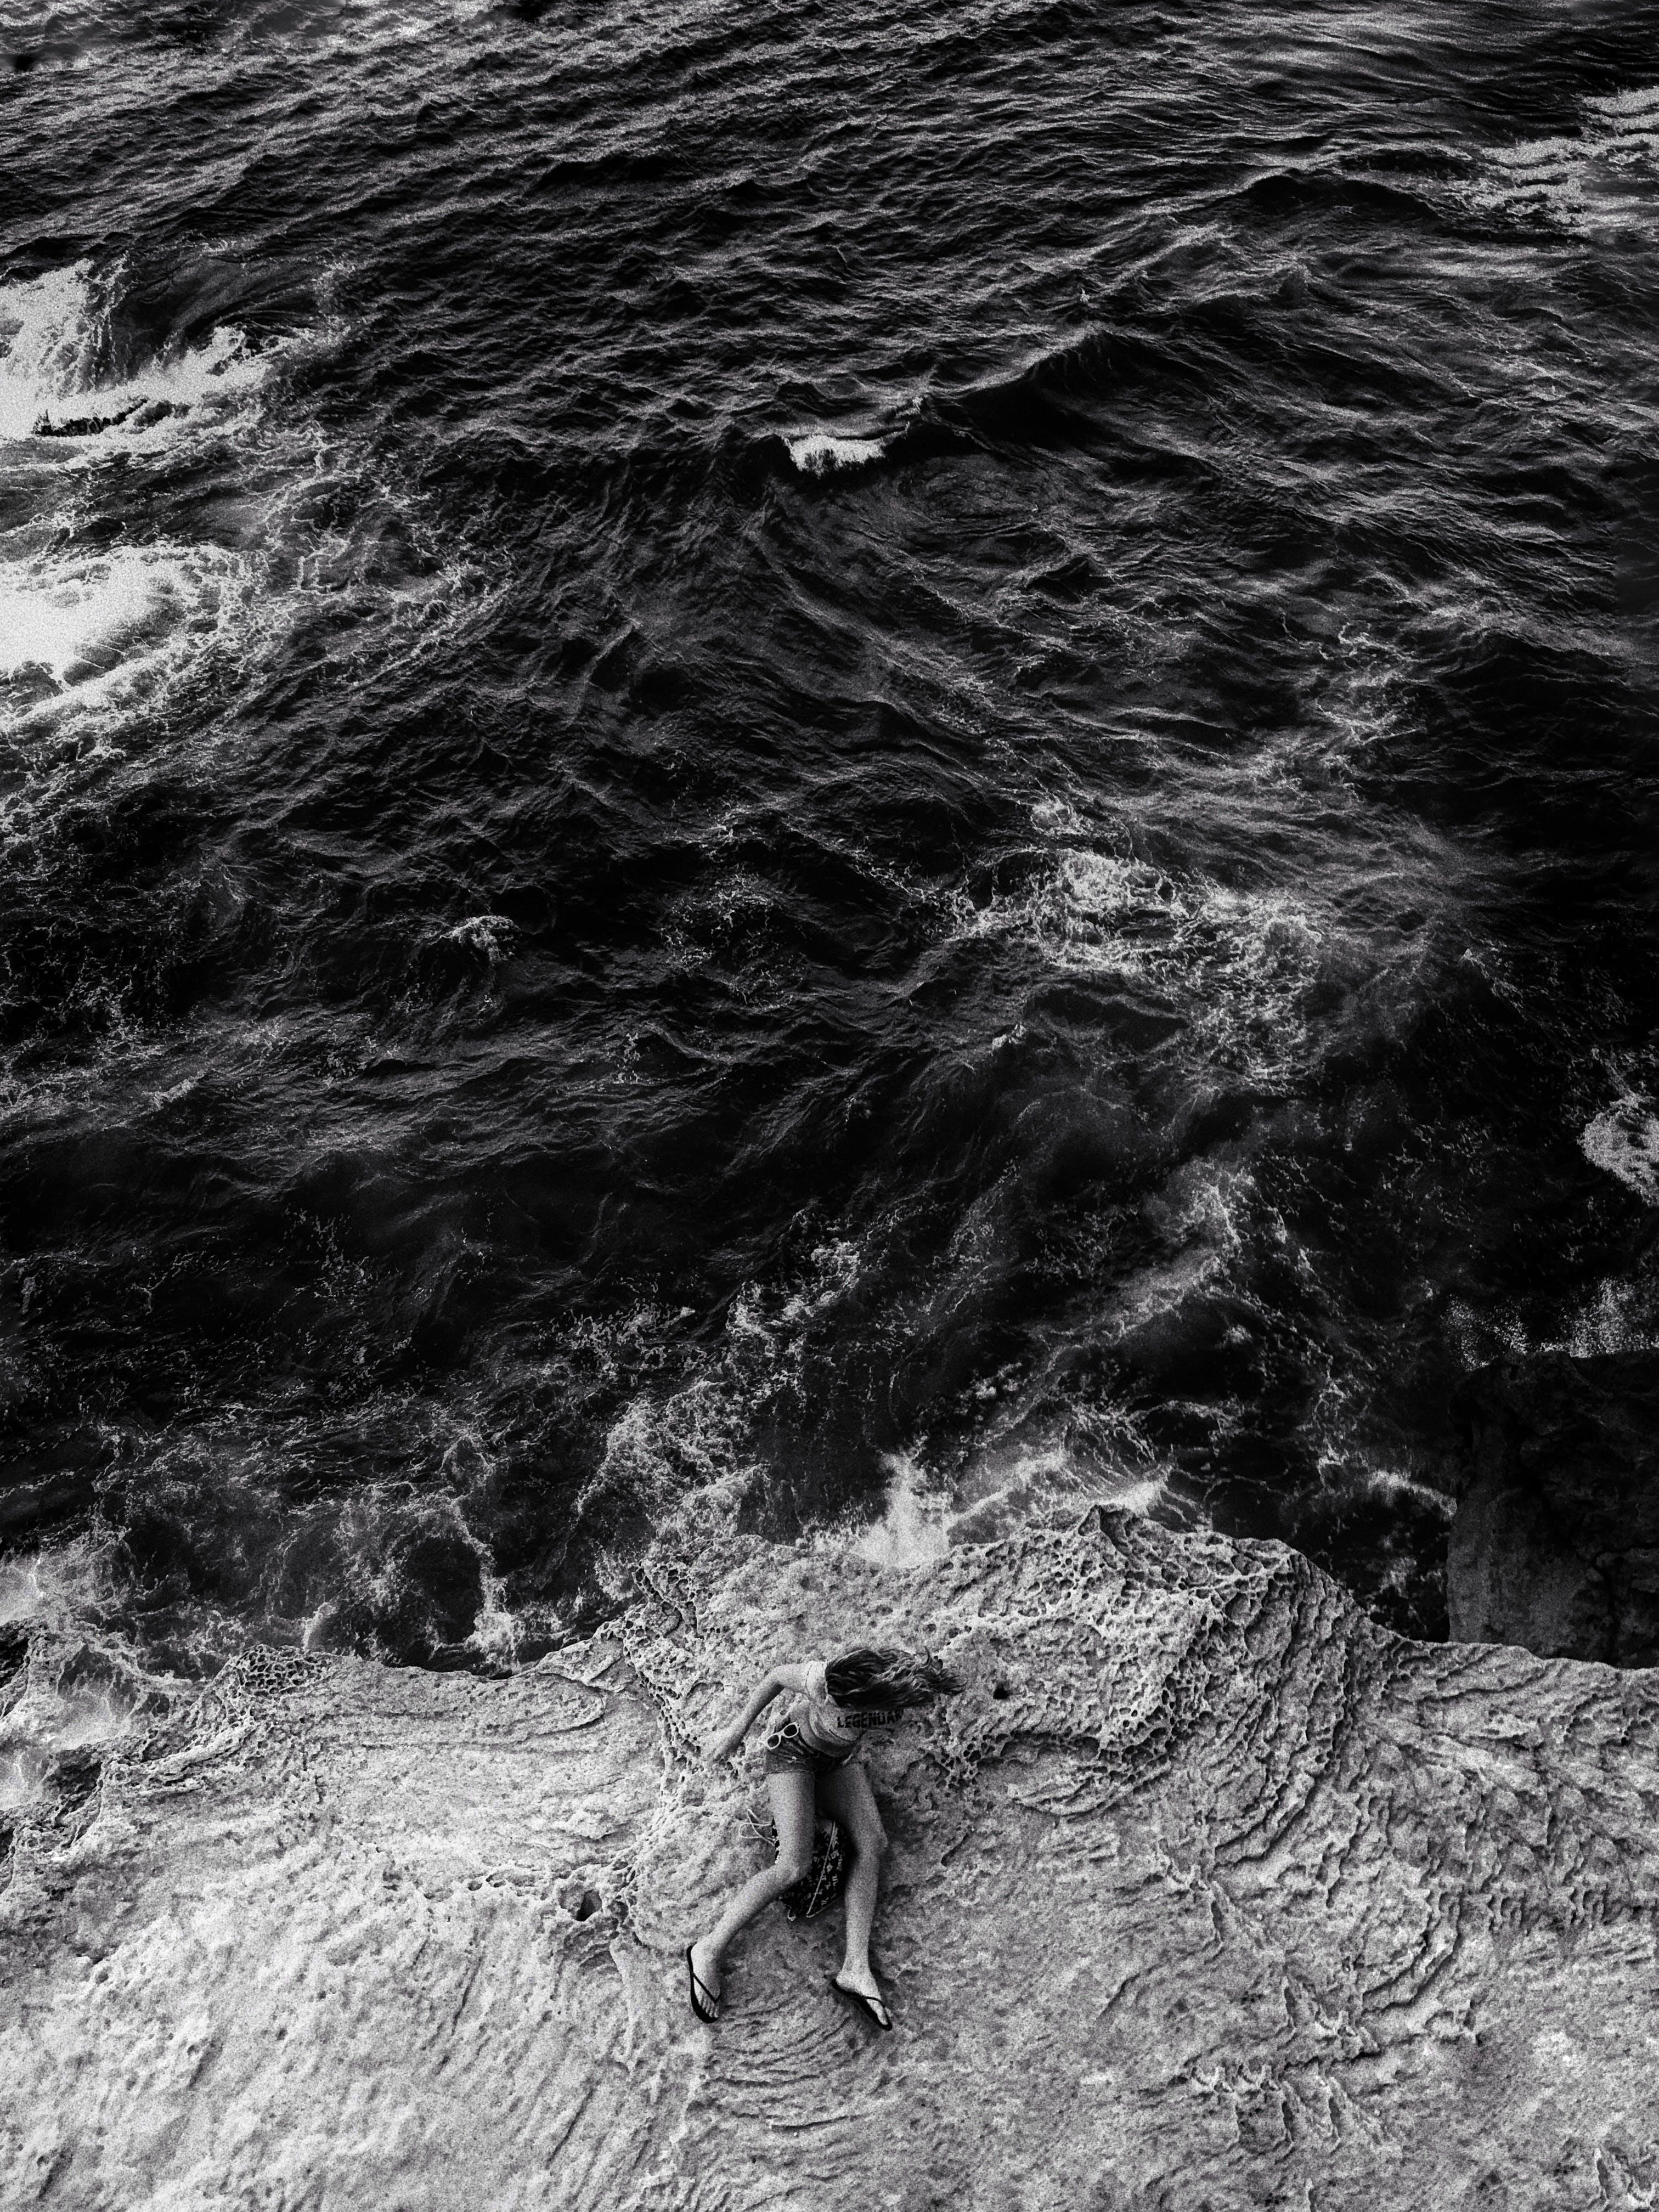 Woman Sitting on Shore